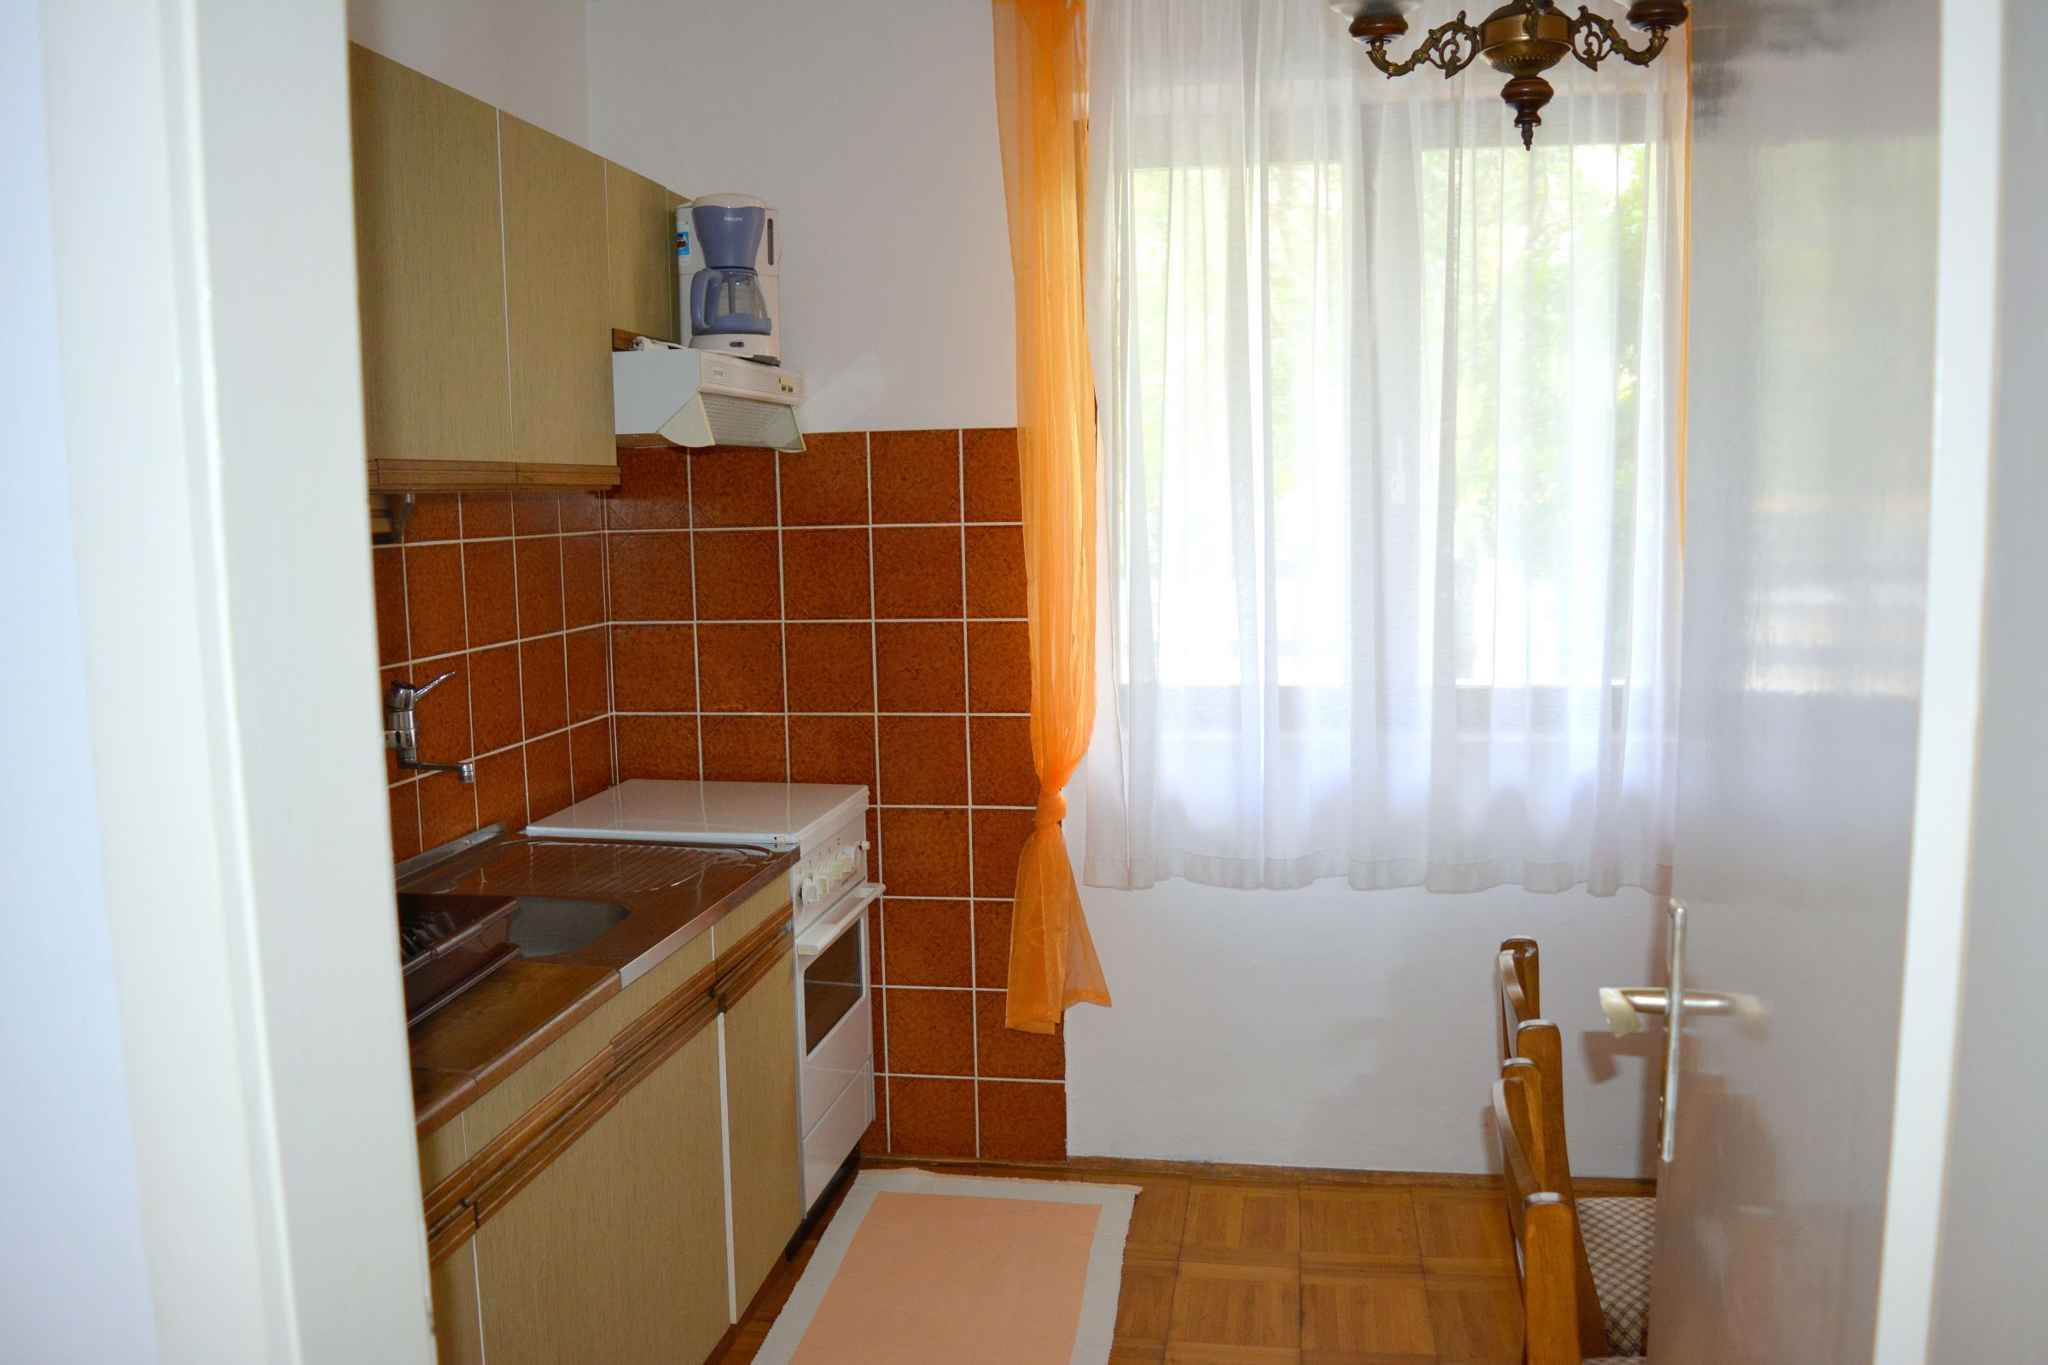 Appartement de vacances mit Terrasse (278776), Vodice, , Dalmatie, Croatie, image 11